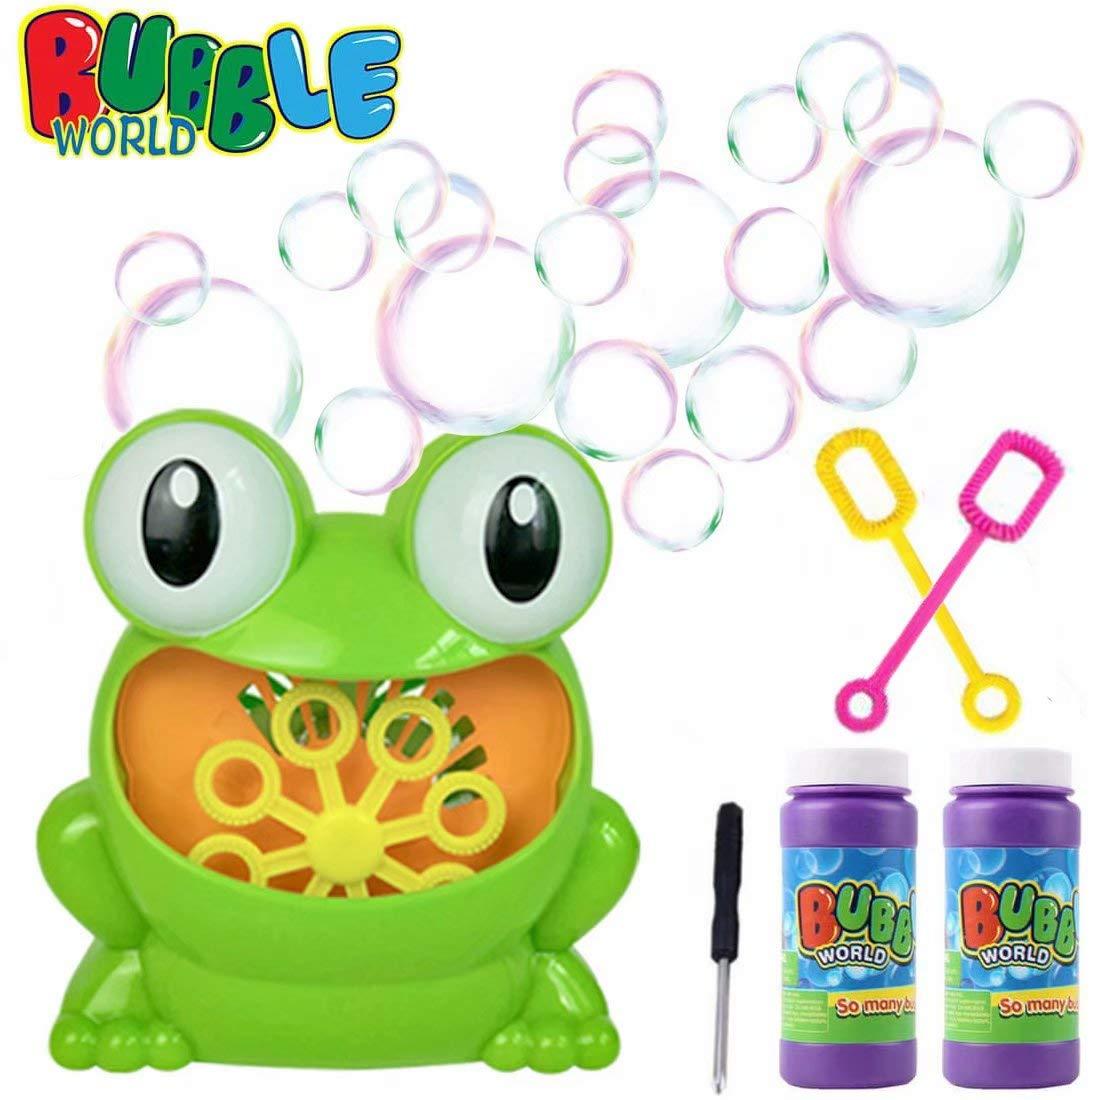 JTORD Bubble Machine Automatic Bubble Blower Durable Portable Bubble Maker For Kids with 2 Bubbles Solution 2 118ml Over 500 Colorful Bubbles Per Minute for Christmas Parties Wedding